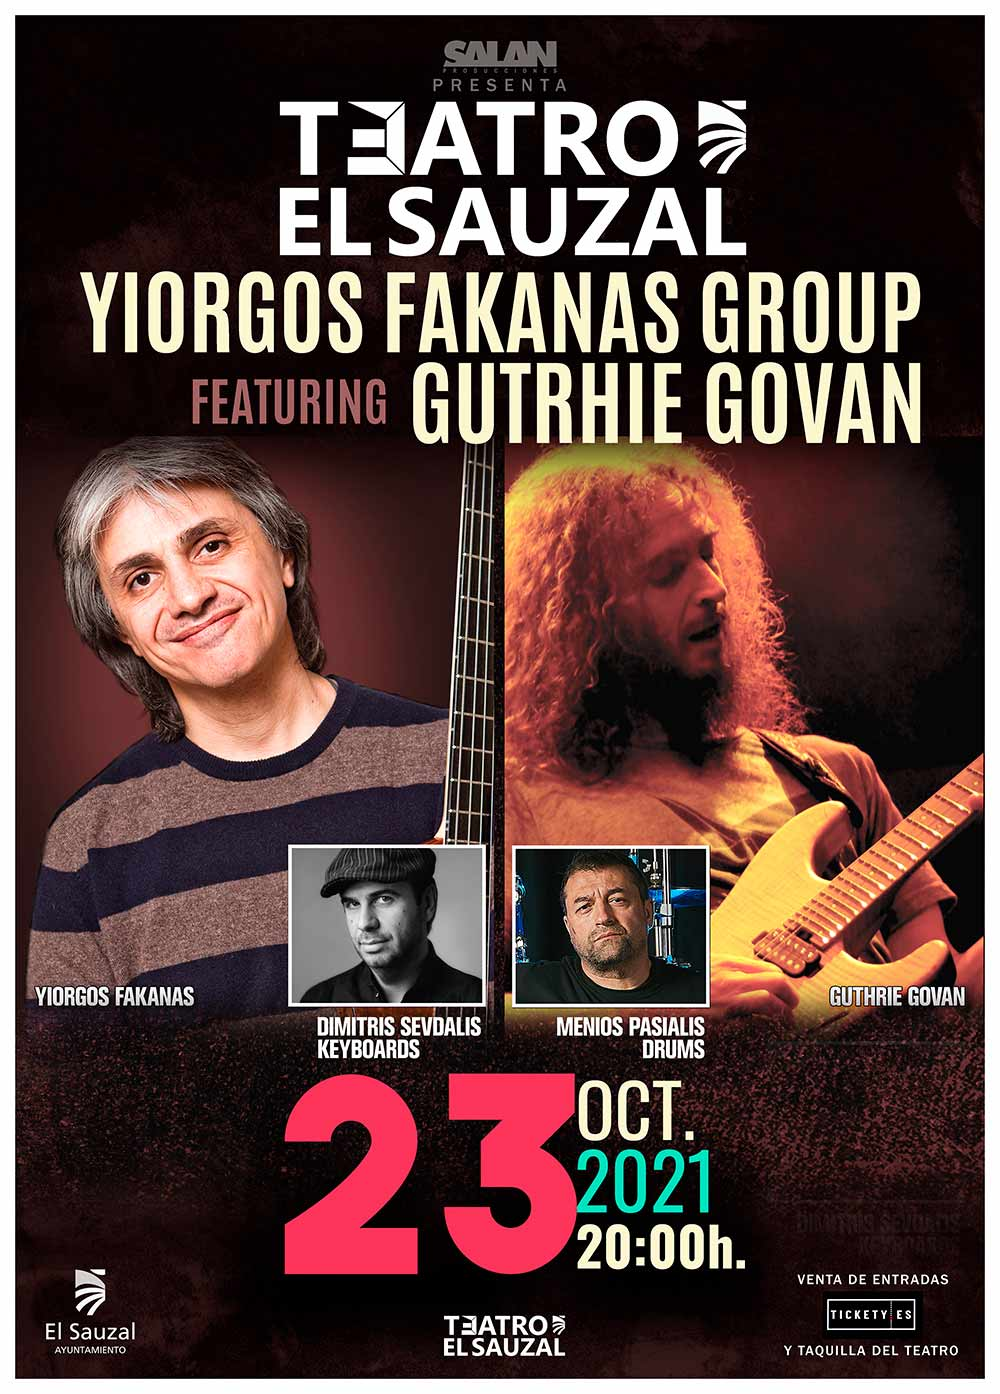 Yiorgos Fakanas Group Featuring Guthrie Govan el sauzal